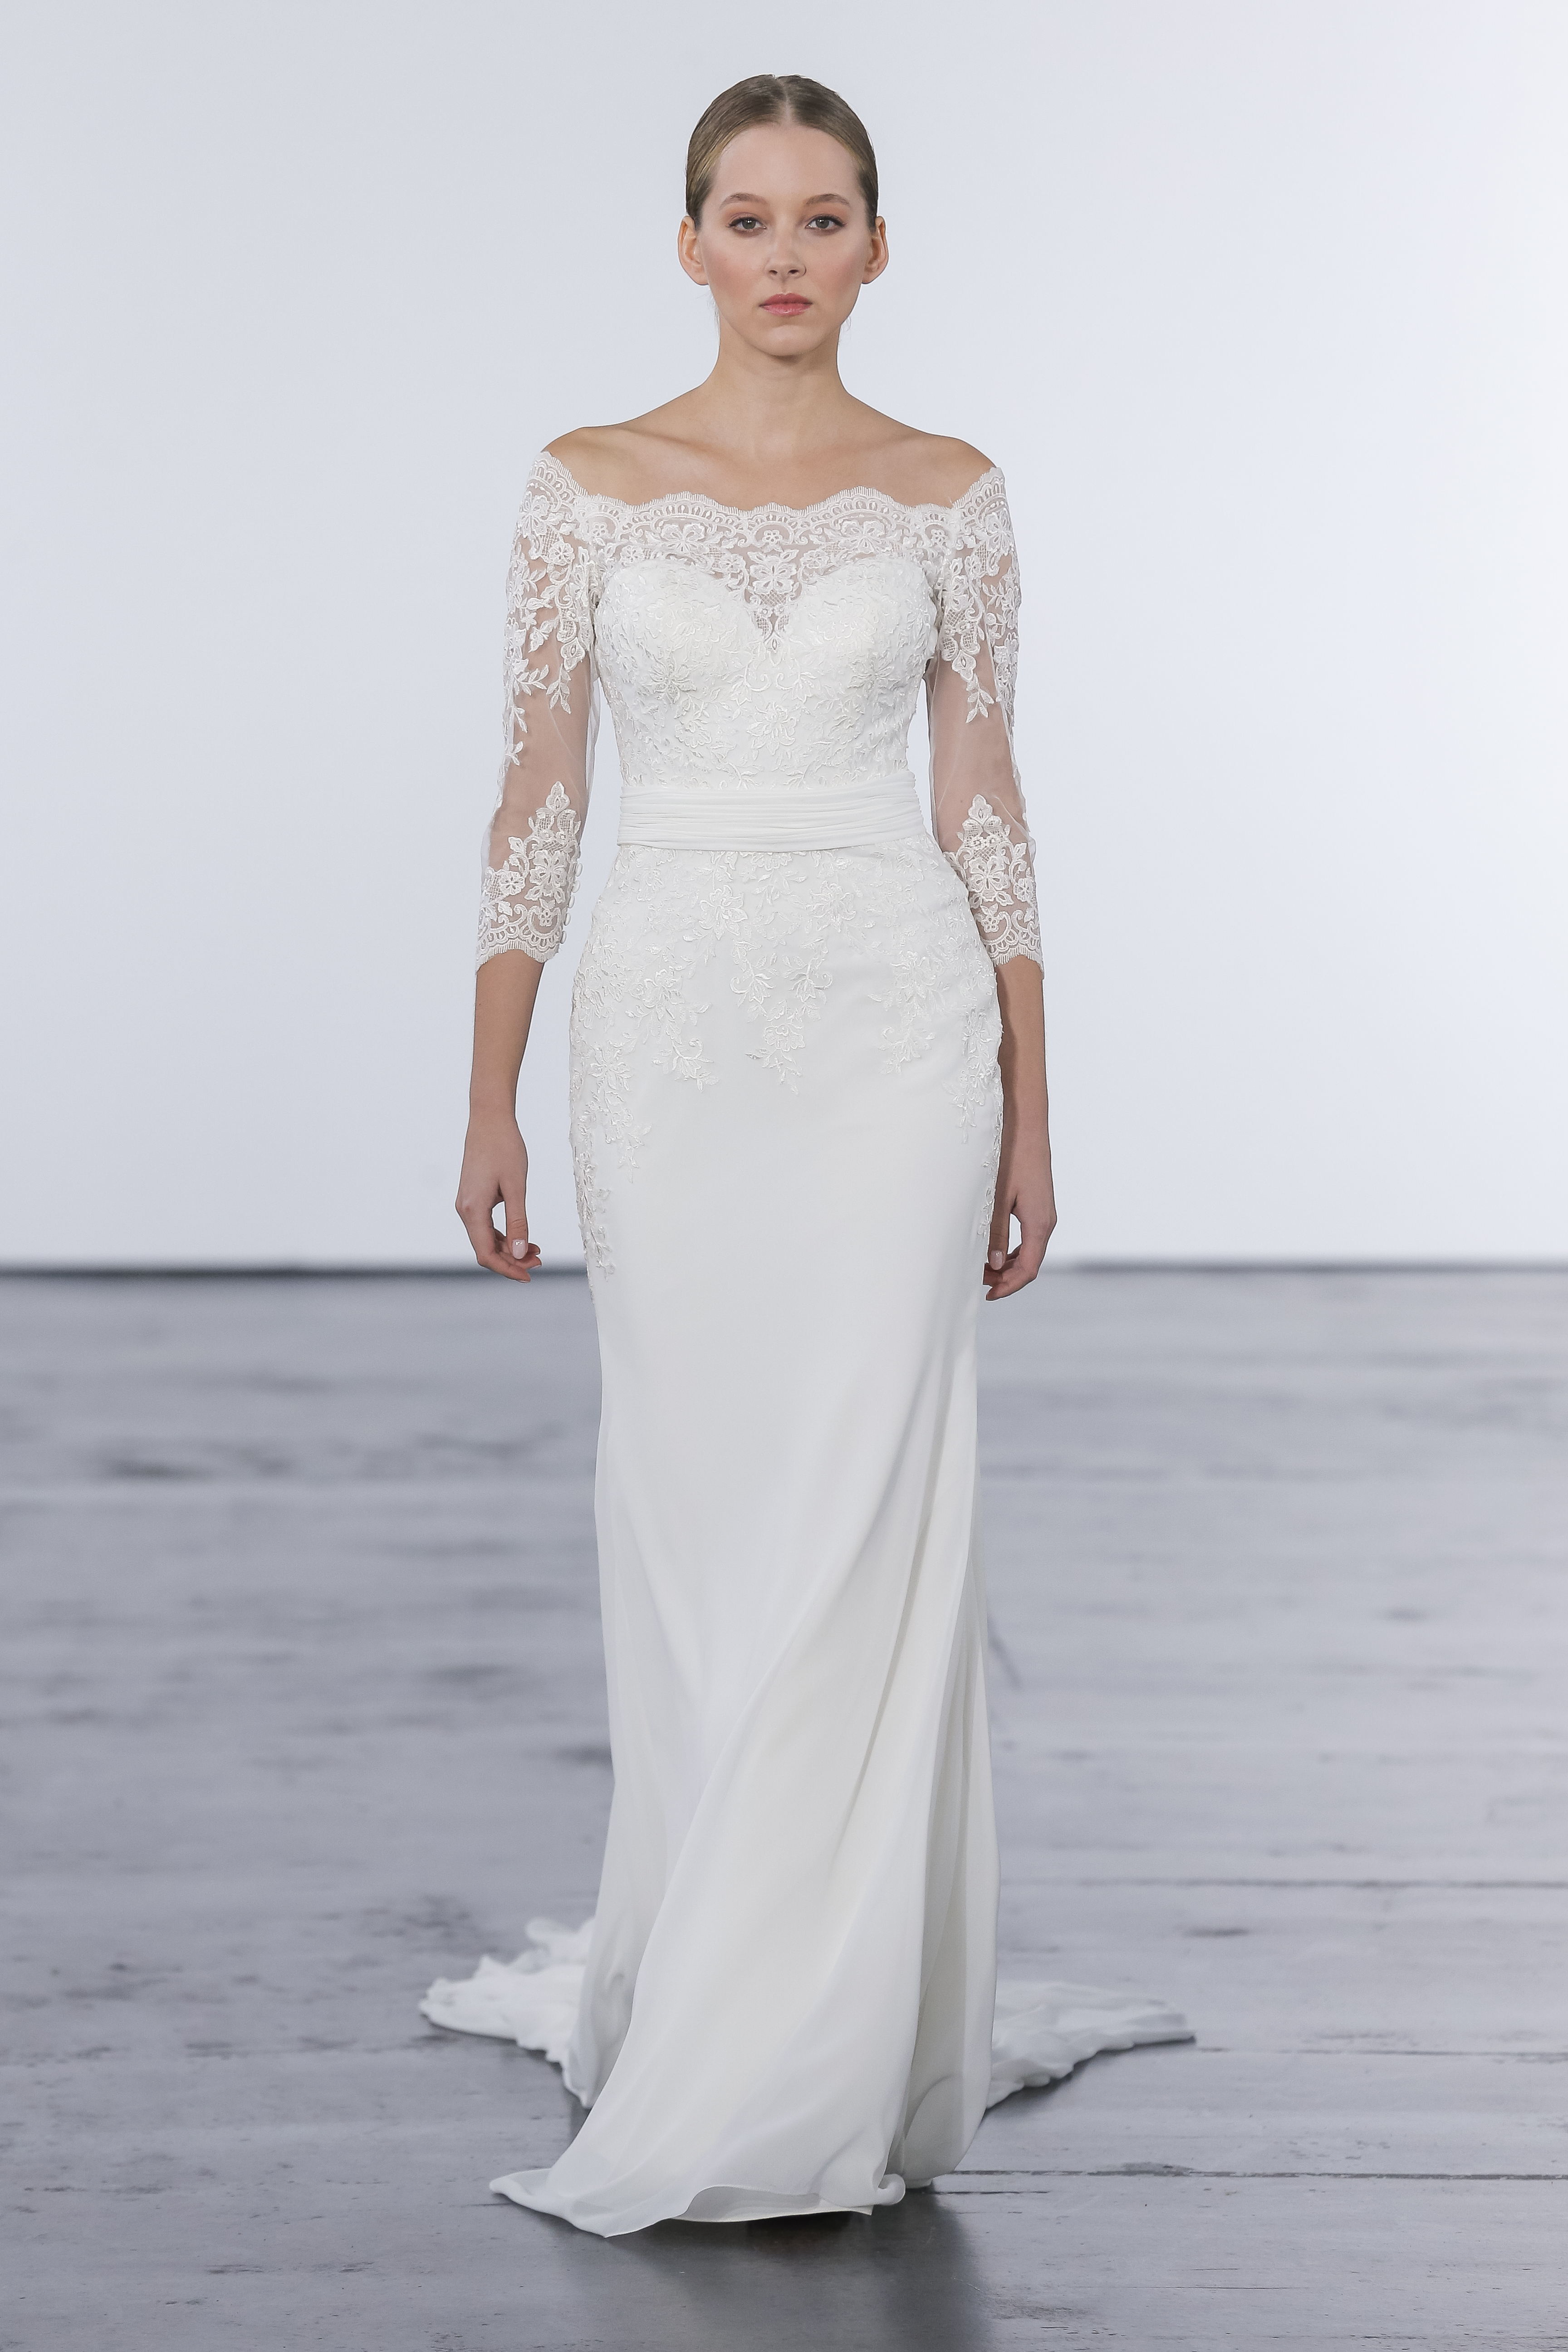 594e78089494f Classic Sheath Wedding Dress | Kleinfeld Bridal